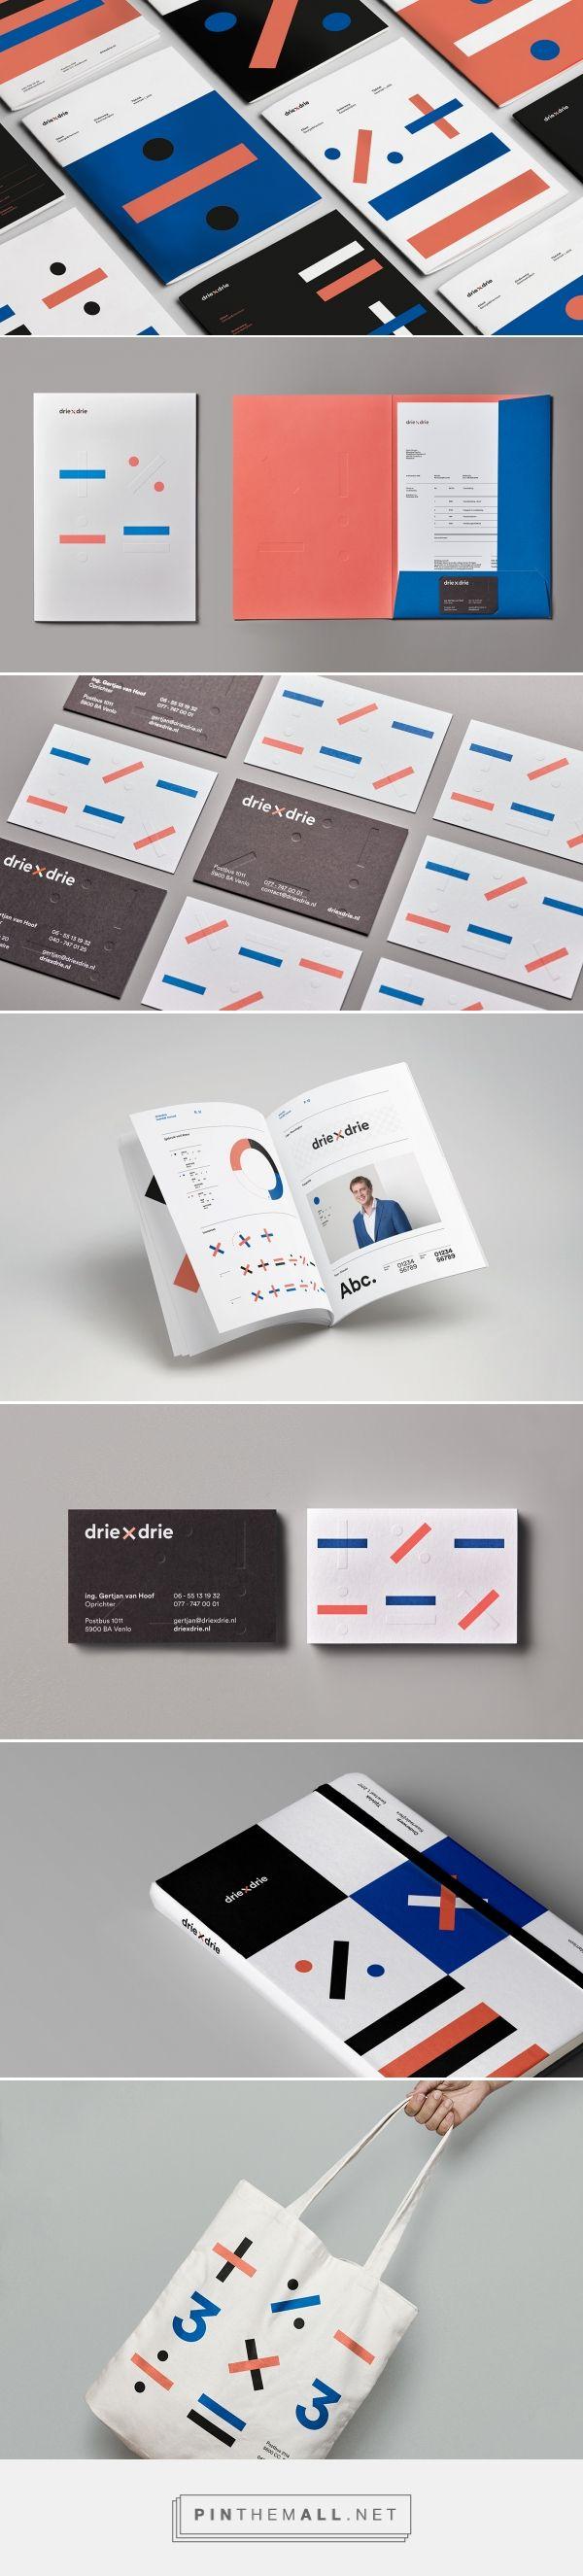 driexdrie - branding   Abduzeedo Design Inspiration - created via https://pinthemall.net